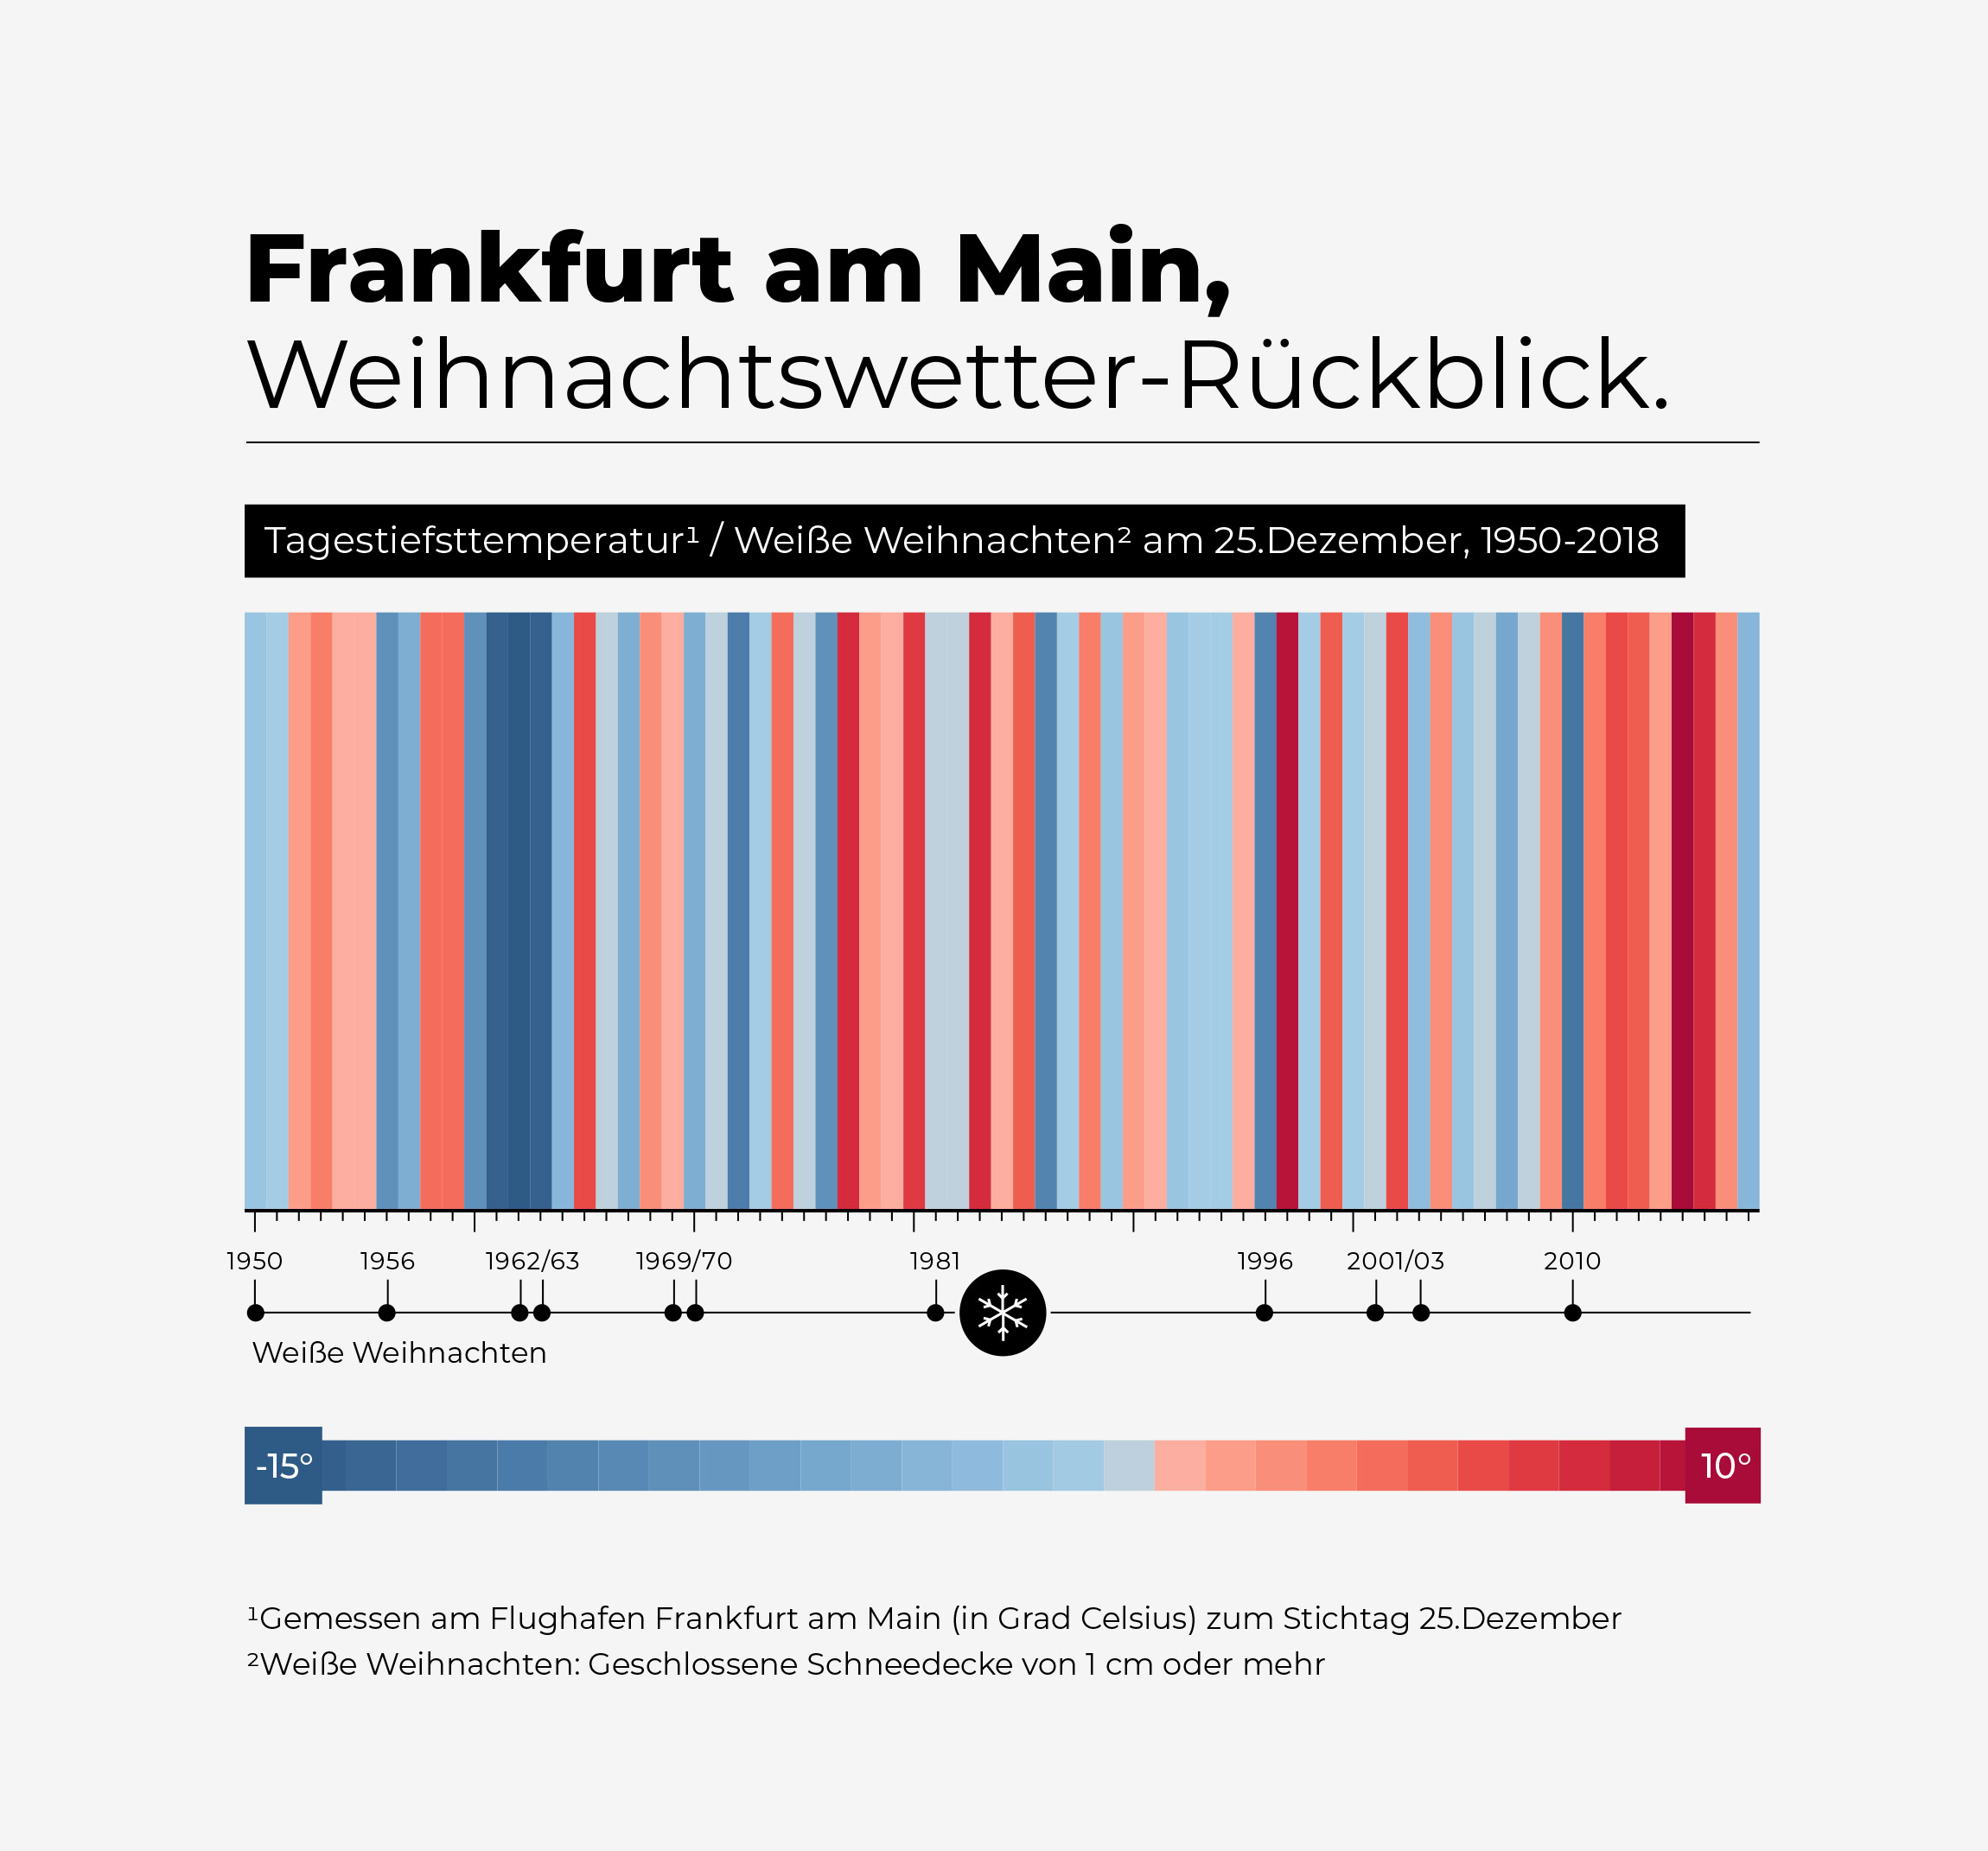 Frankfurt Weihnachtswetter-Rückblick 1950-2018